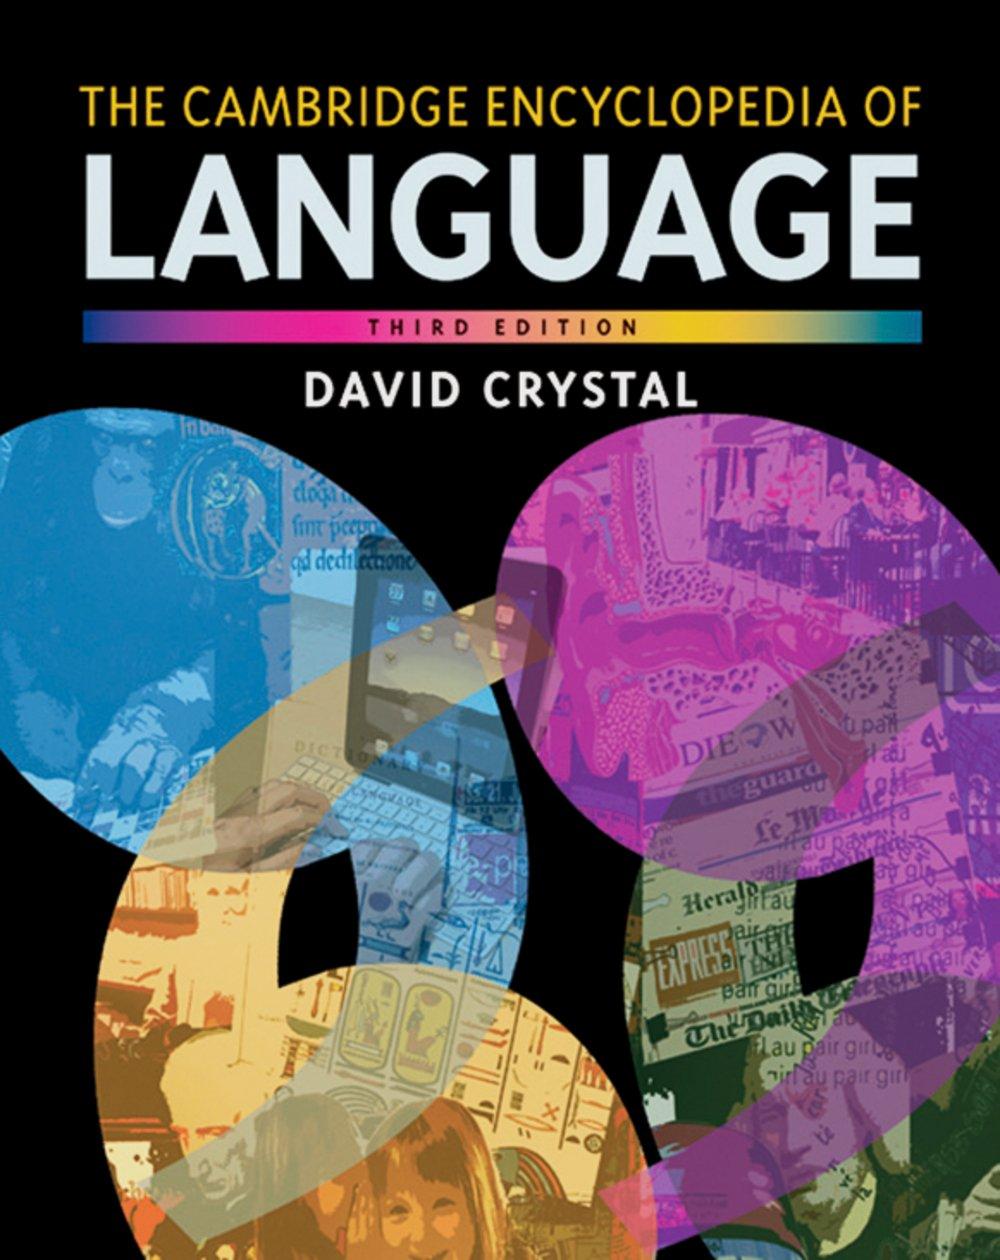 The Cambridge Encyclopedia of Language: Paperback